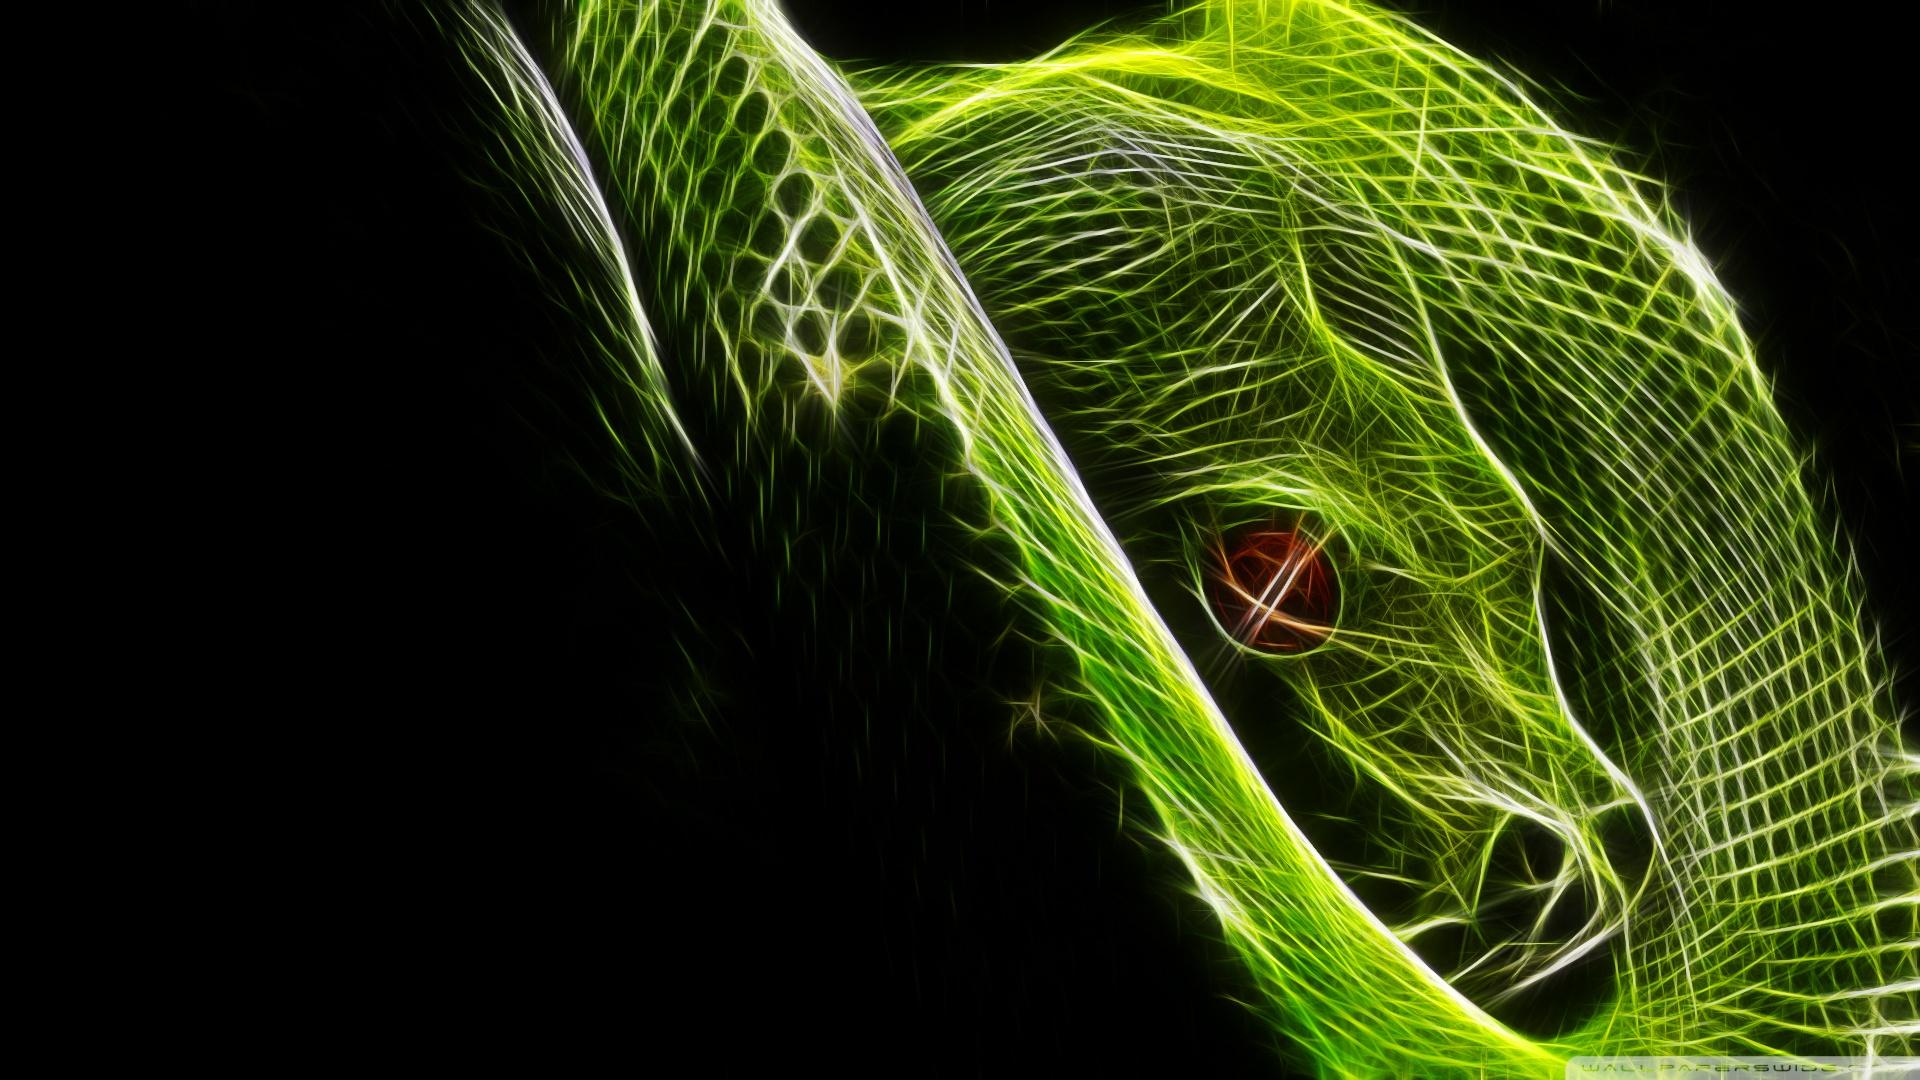 48 neon snake wallpaper on wallpapersafari - Green snake hd wallpaper ...